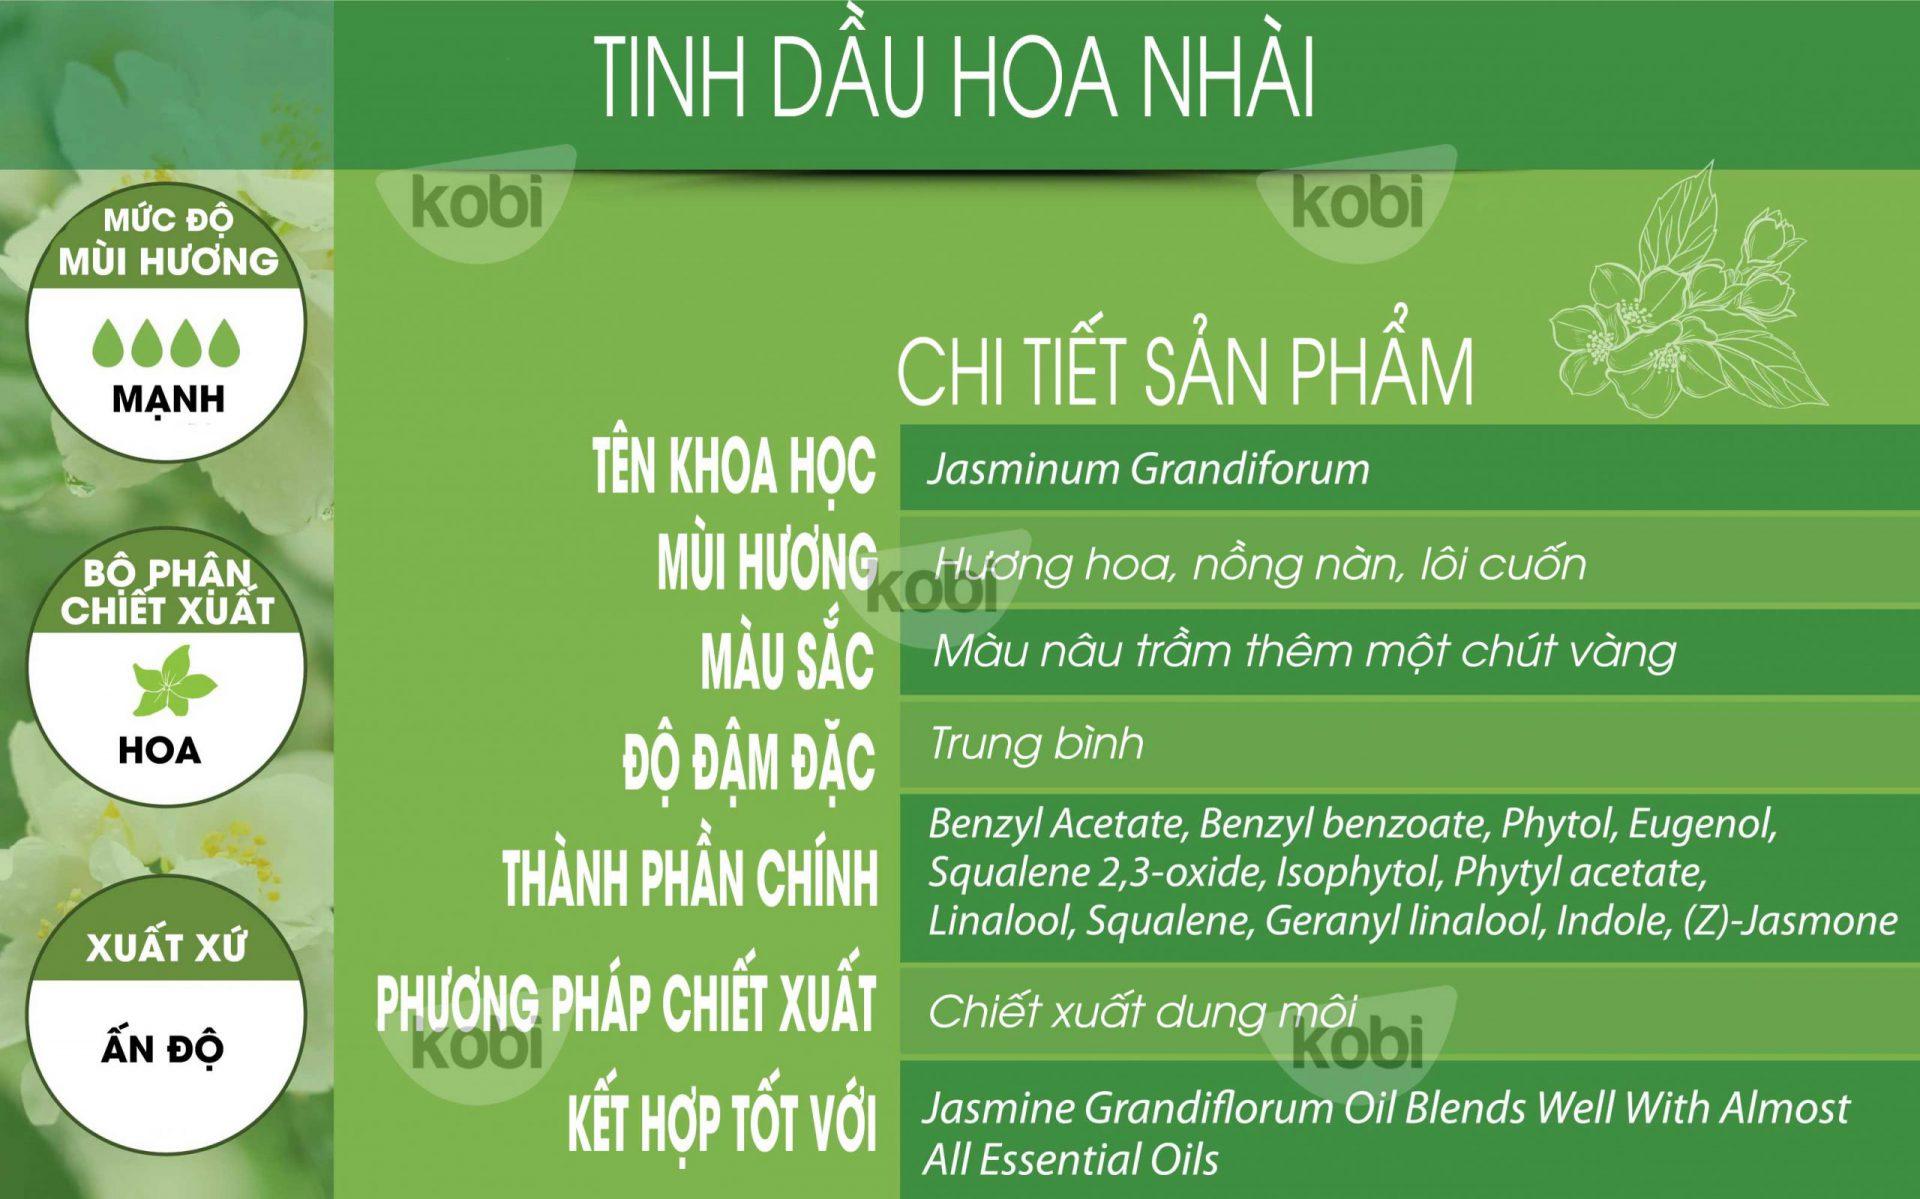 Tinh dầu hoa nhài Kobi (Jasmine essential oil)